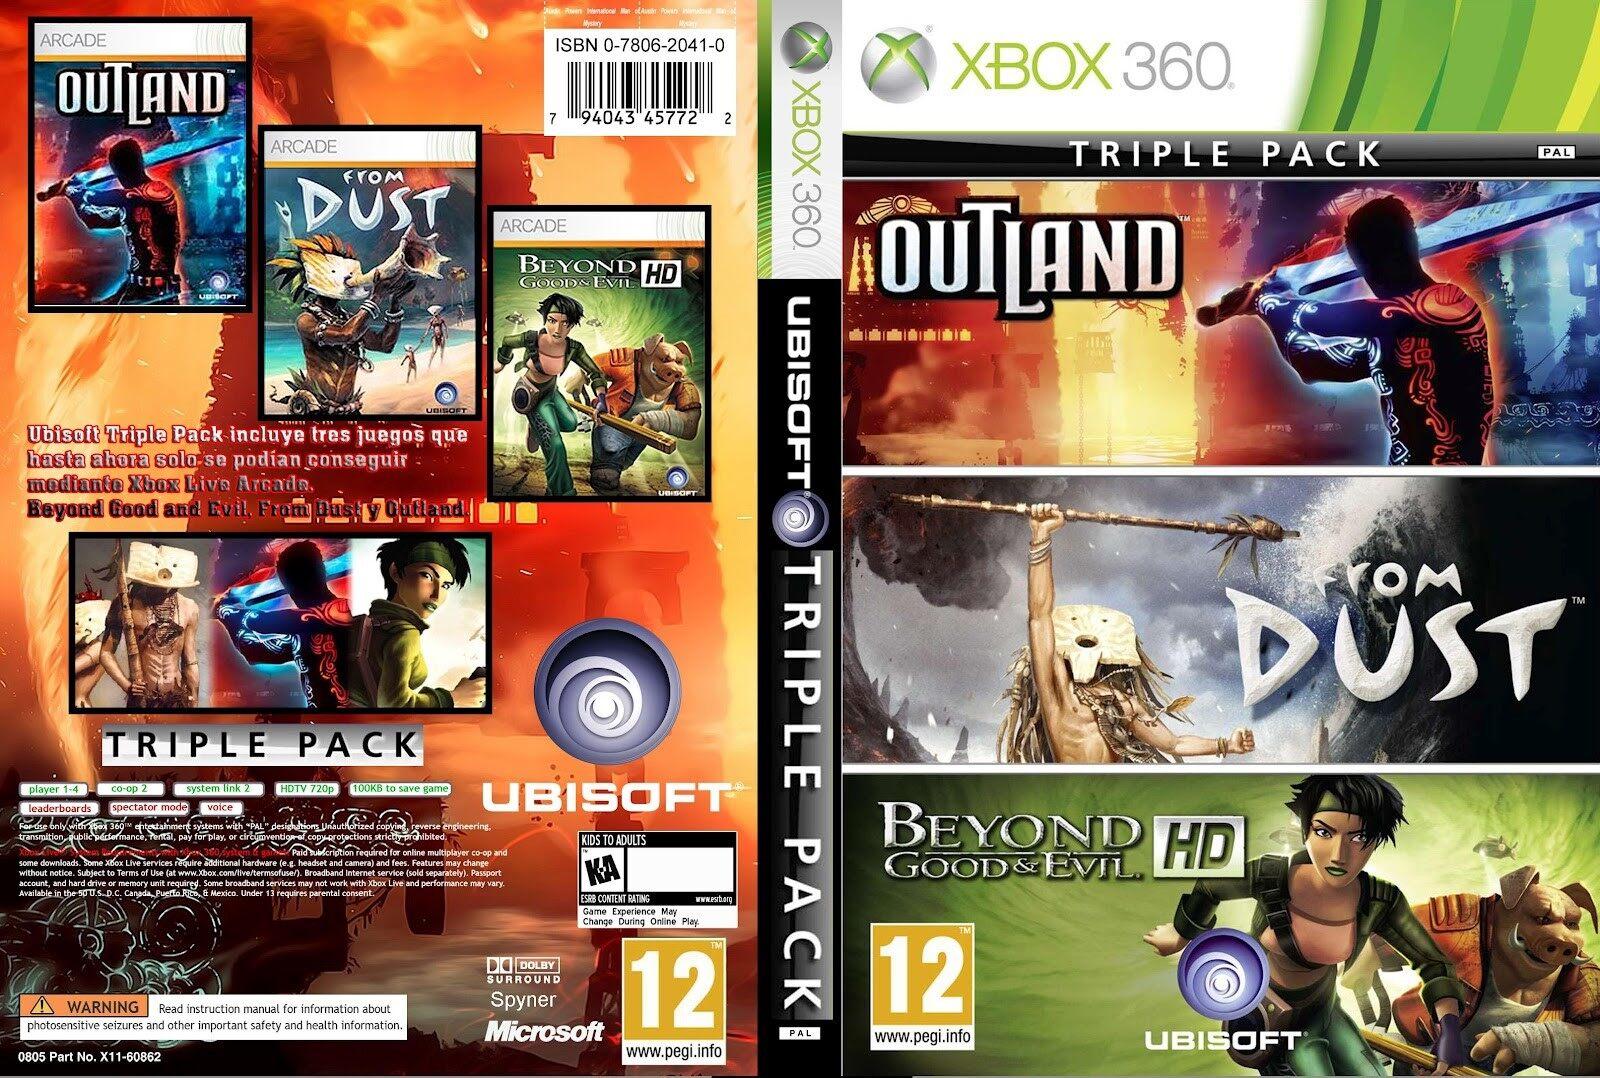 XBOX 360 Ubisoft Triple Pack